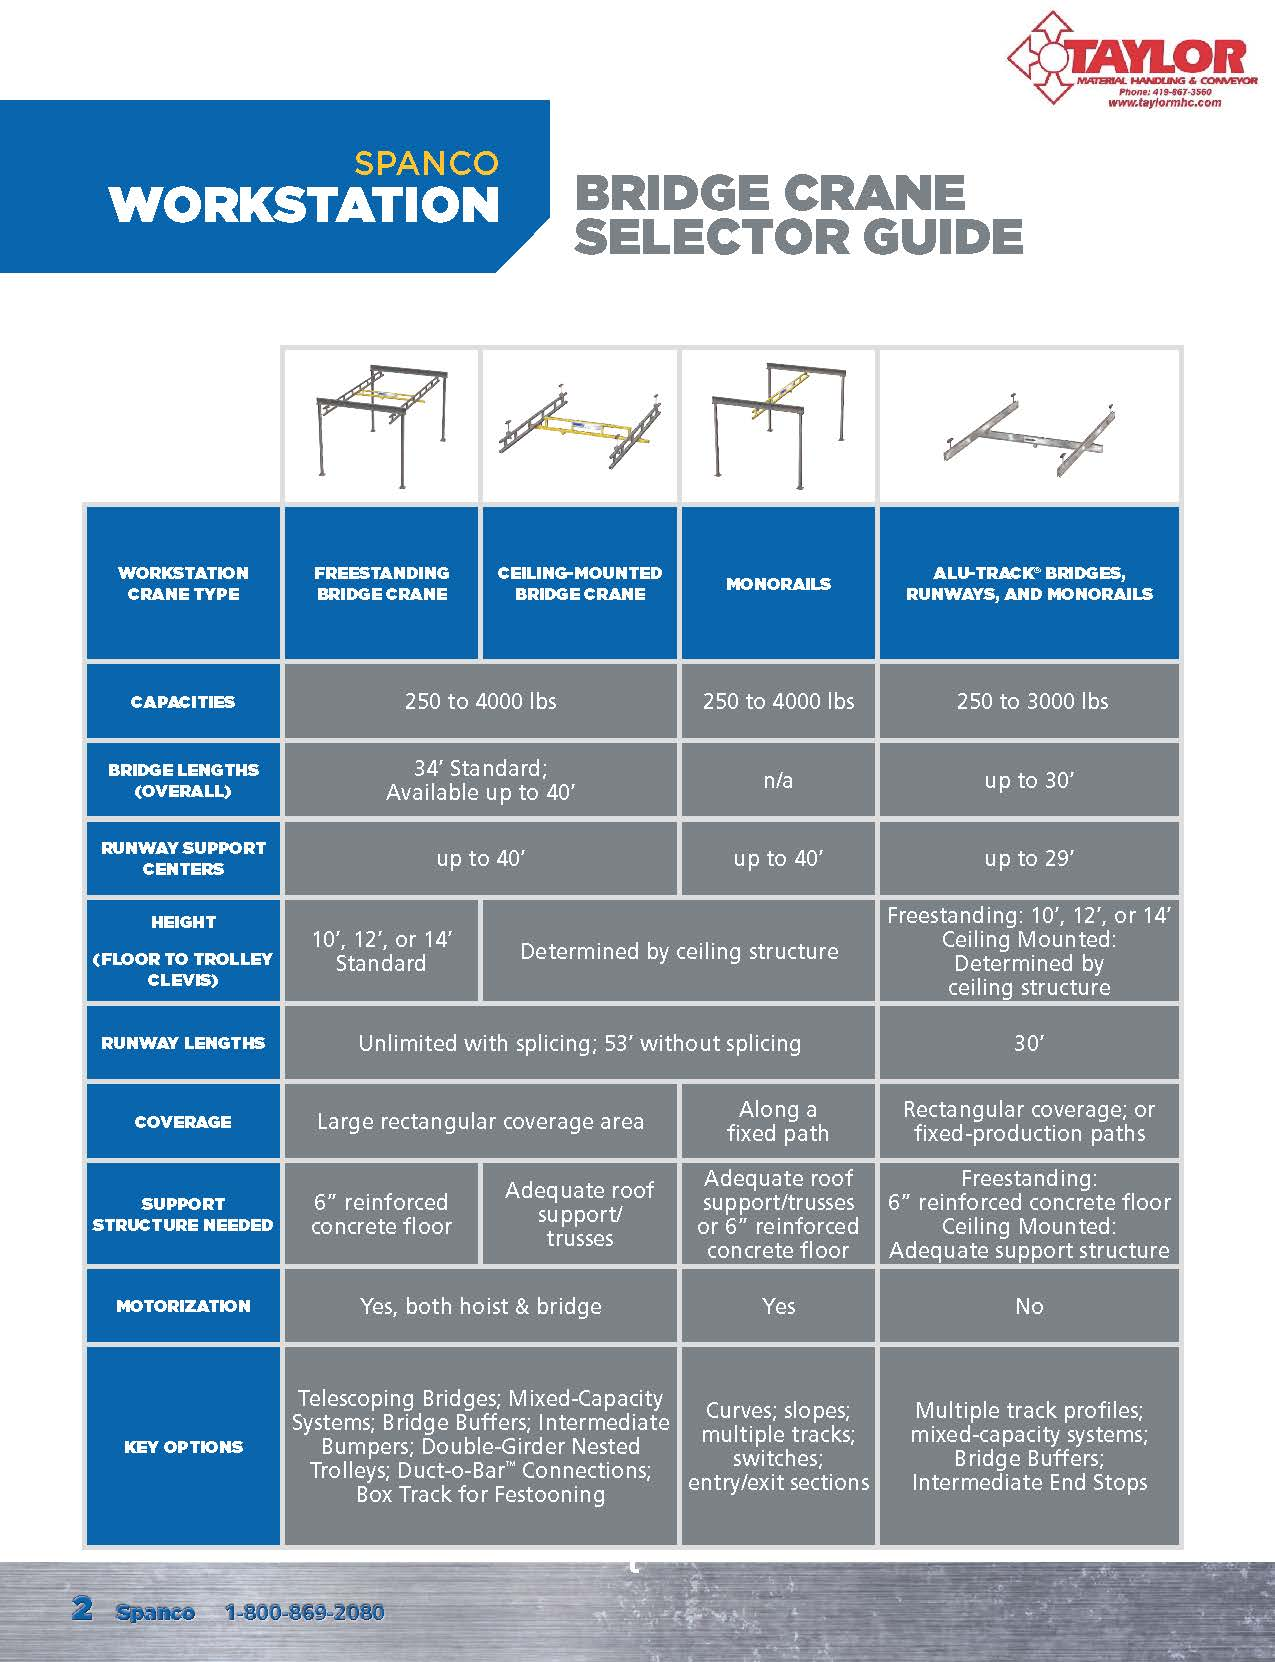 Spanco Workstation Crane Selector Guide